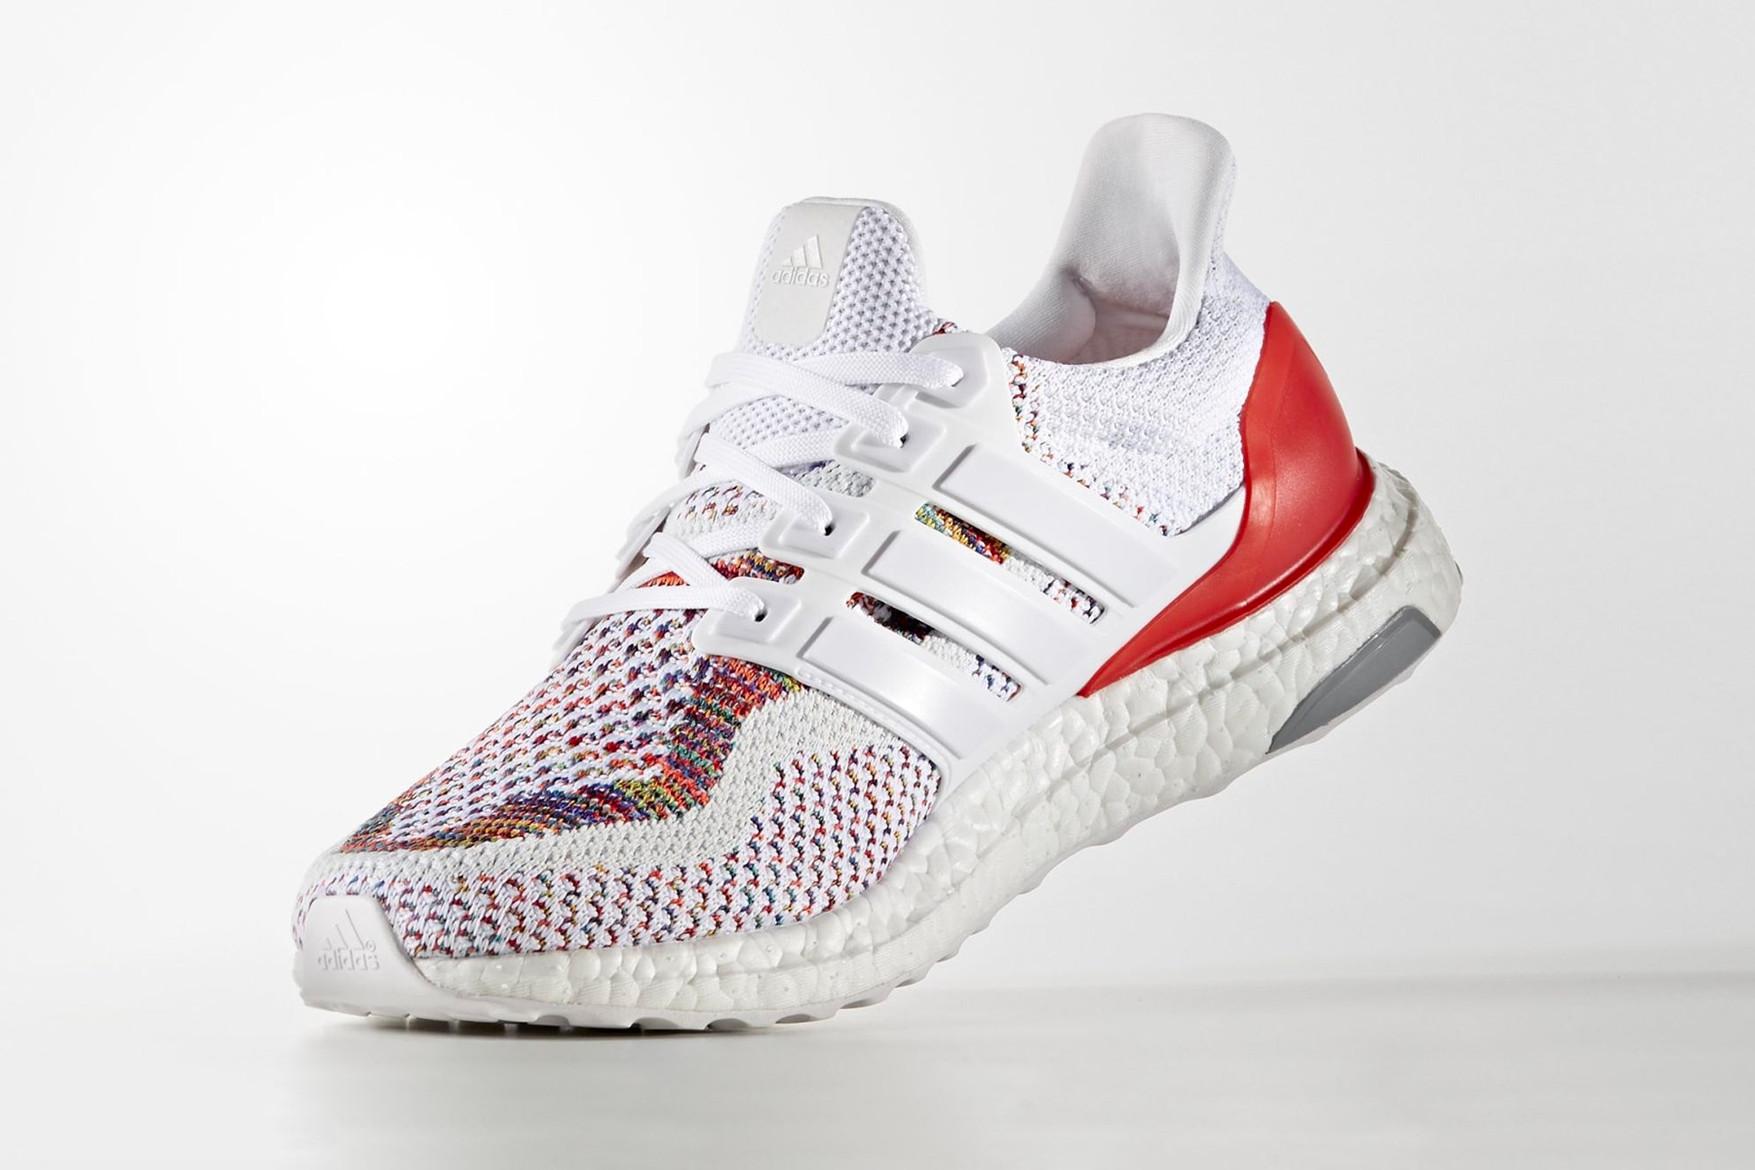 adidas-ultraboost-multicolor-2-0-release-date-2